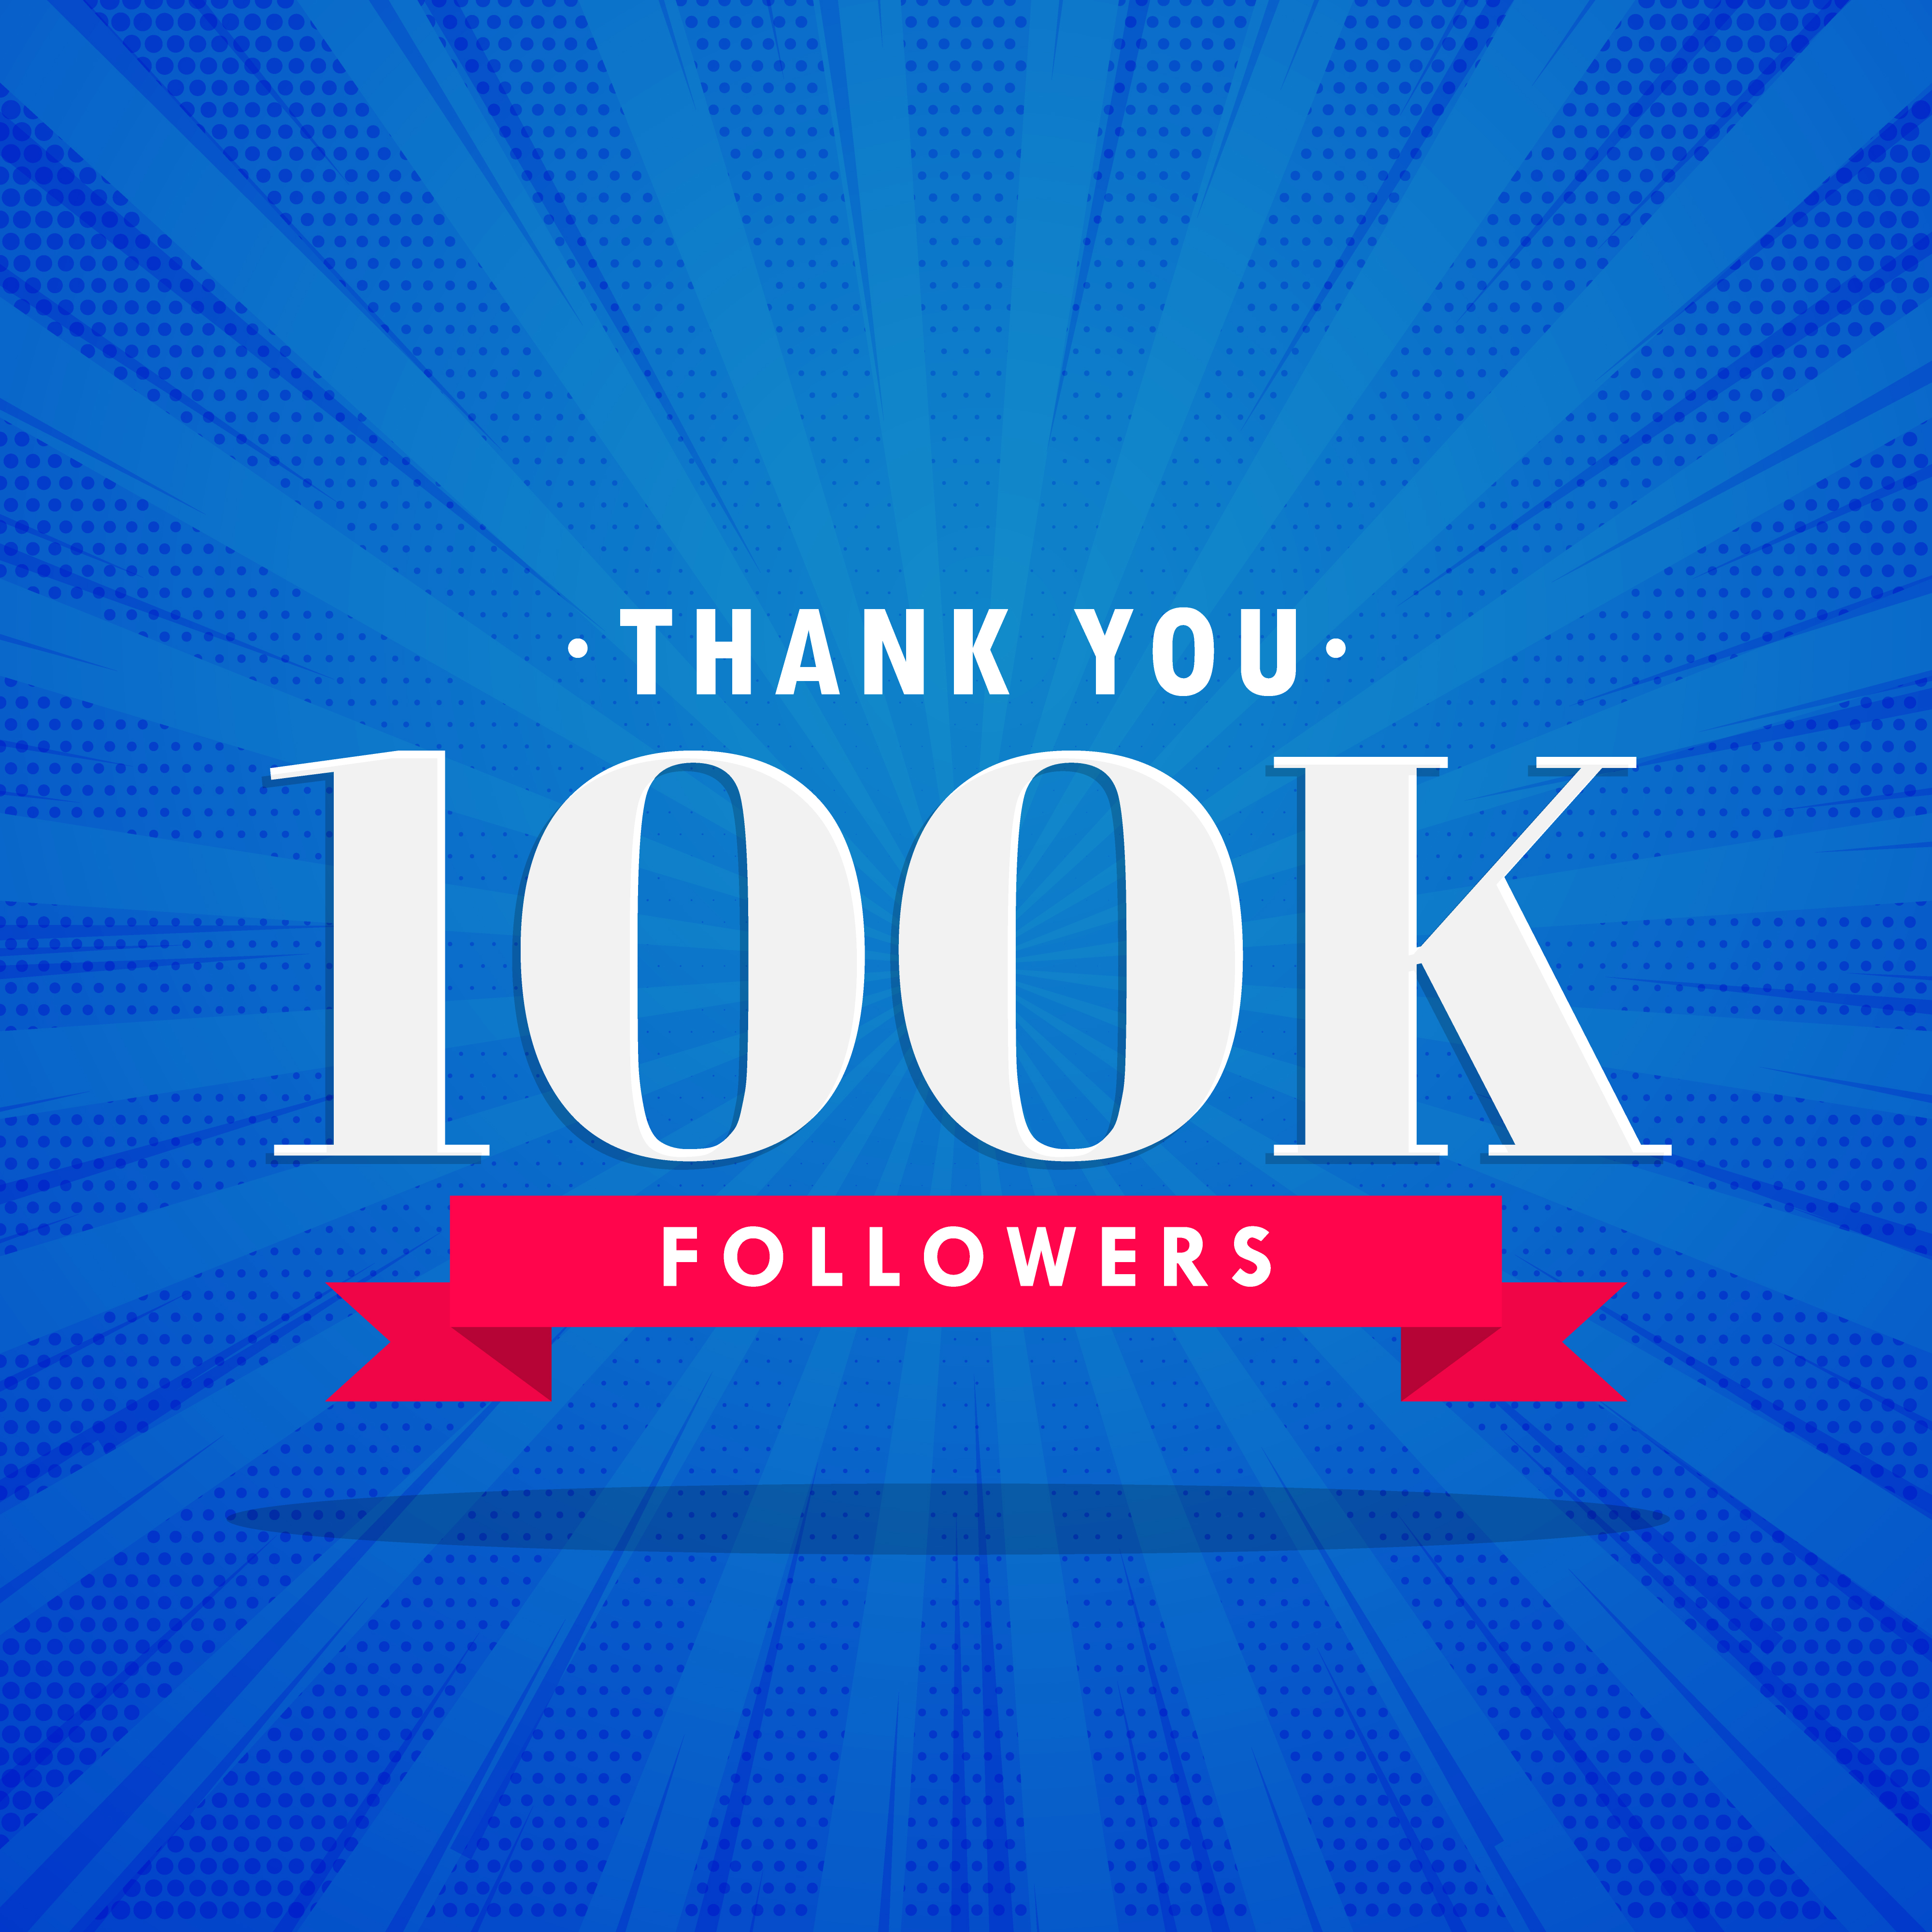 1000 follower celebration - 2 9